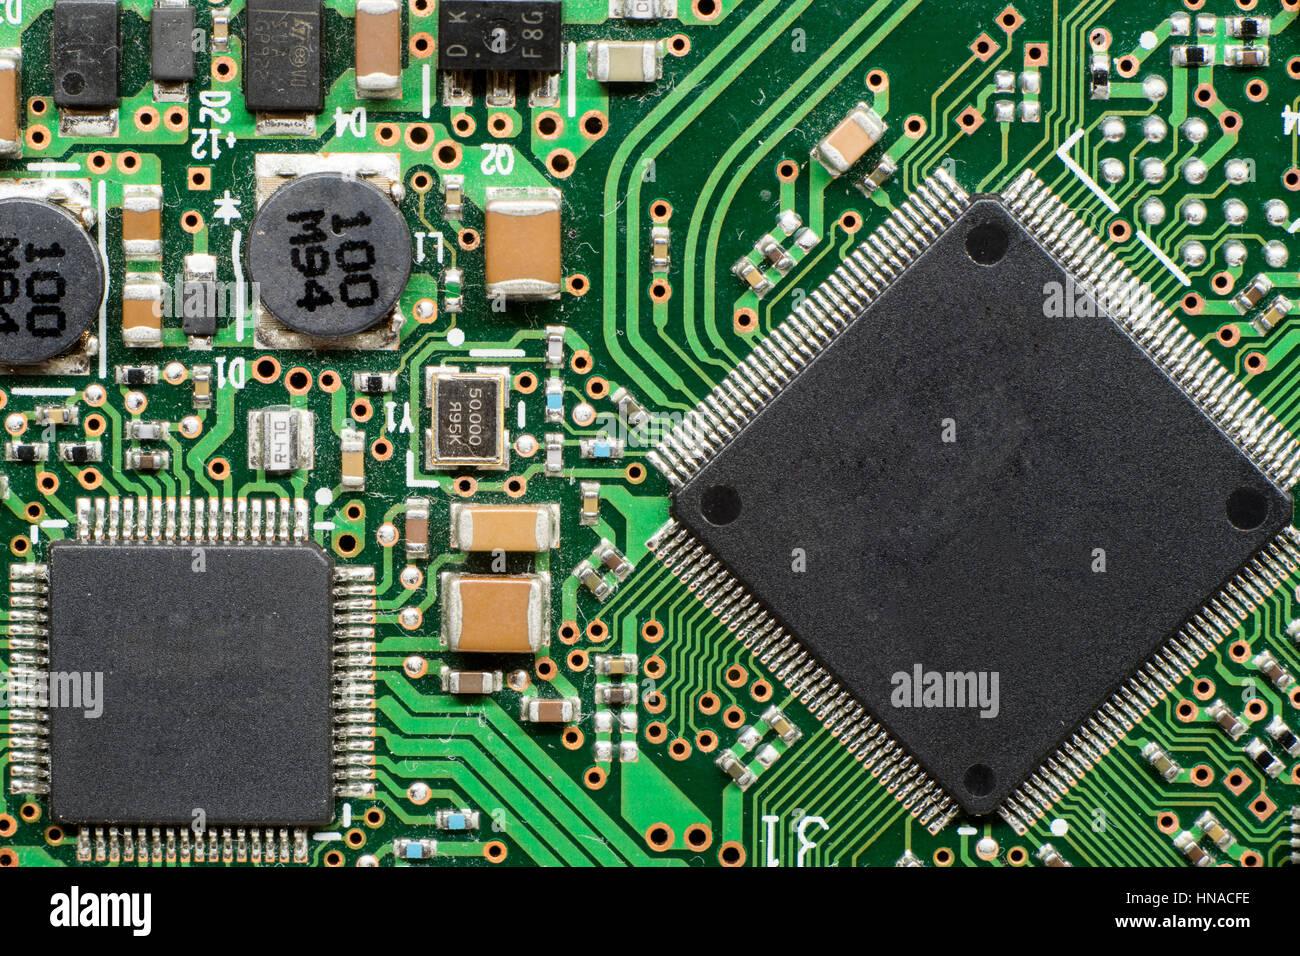 Semiconductor Information Circuit Motherboard Stockfotos ...